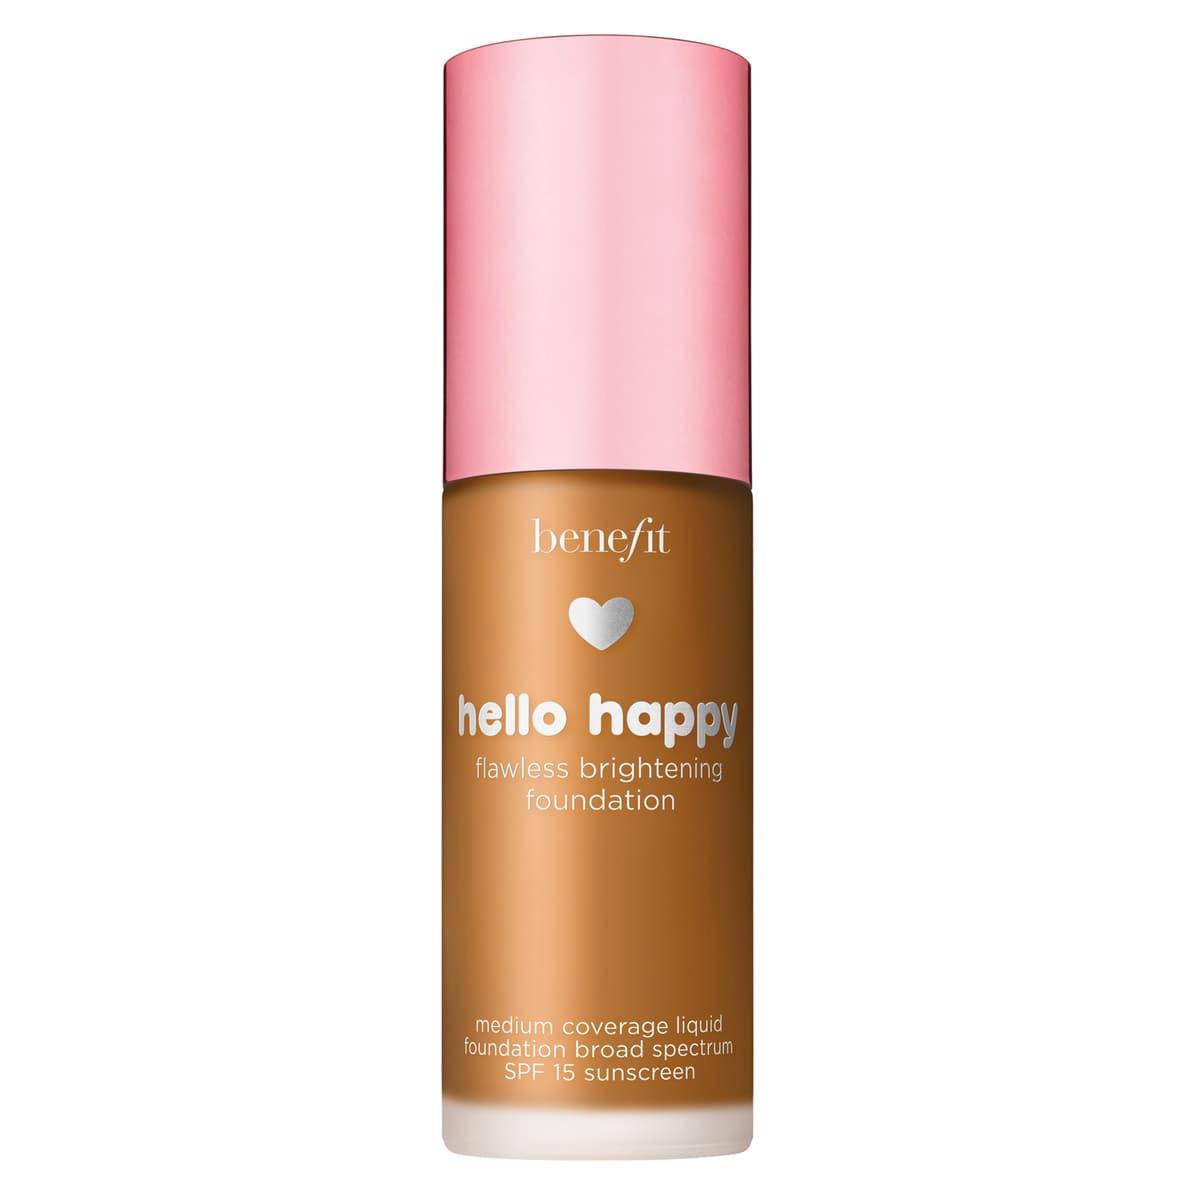 Benefit Hello Happy Flawless Brightening Foundation 8